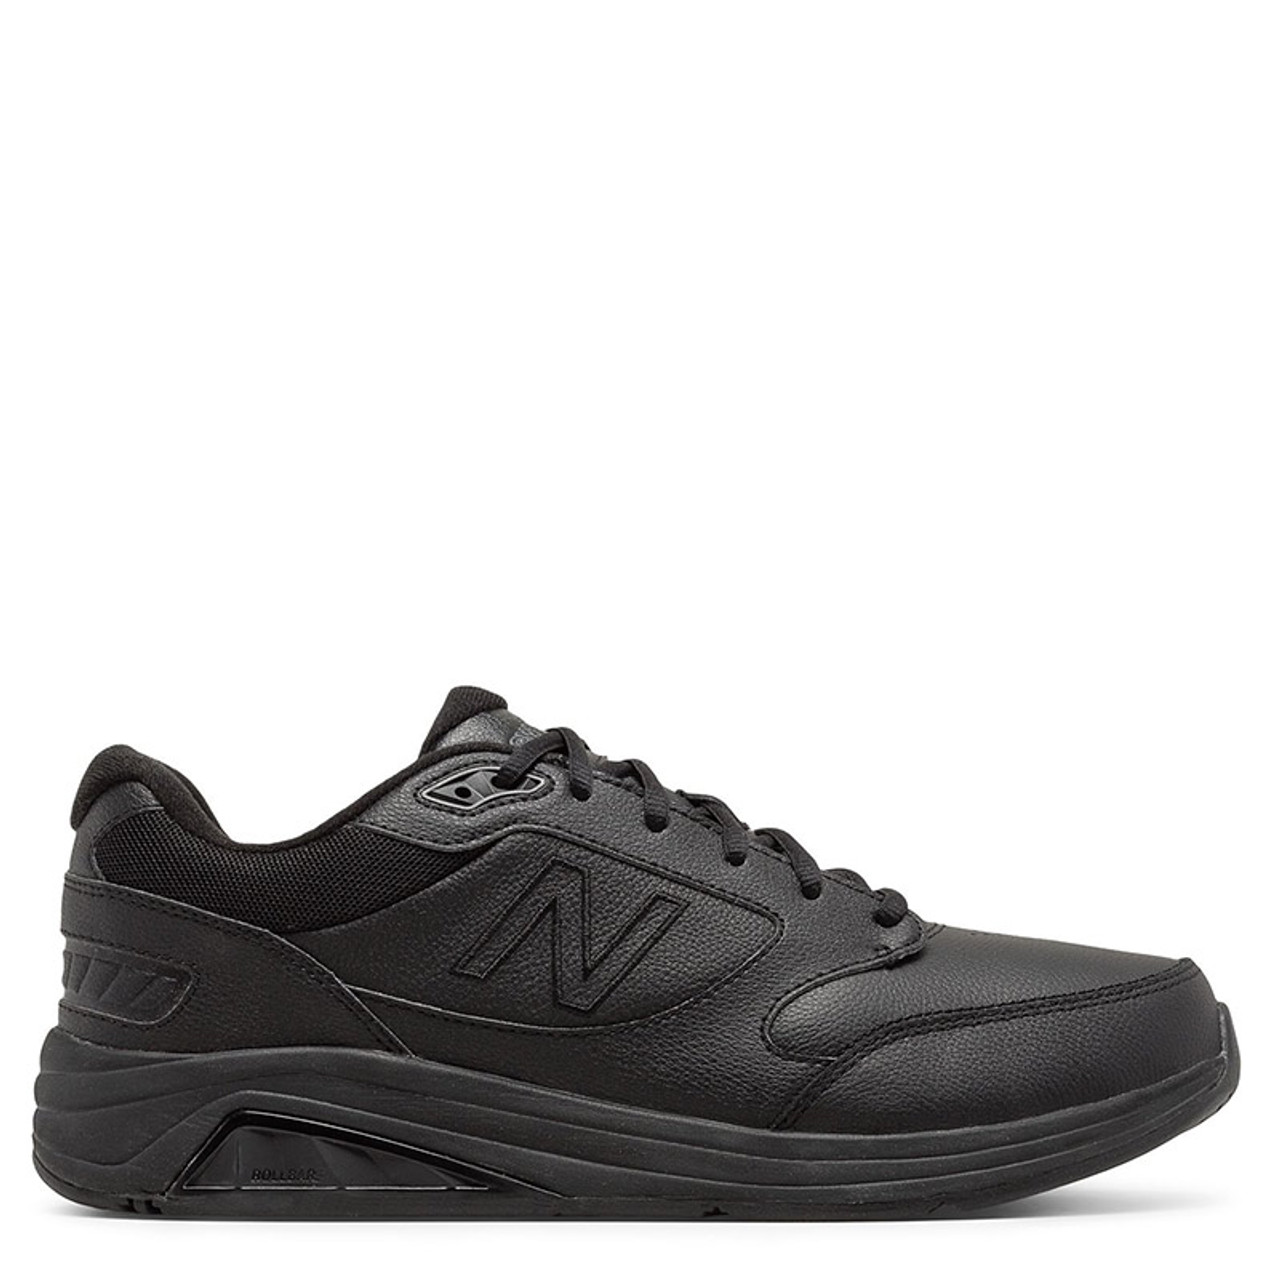 New Balance 928v3 Men's Black Leather